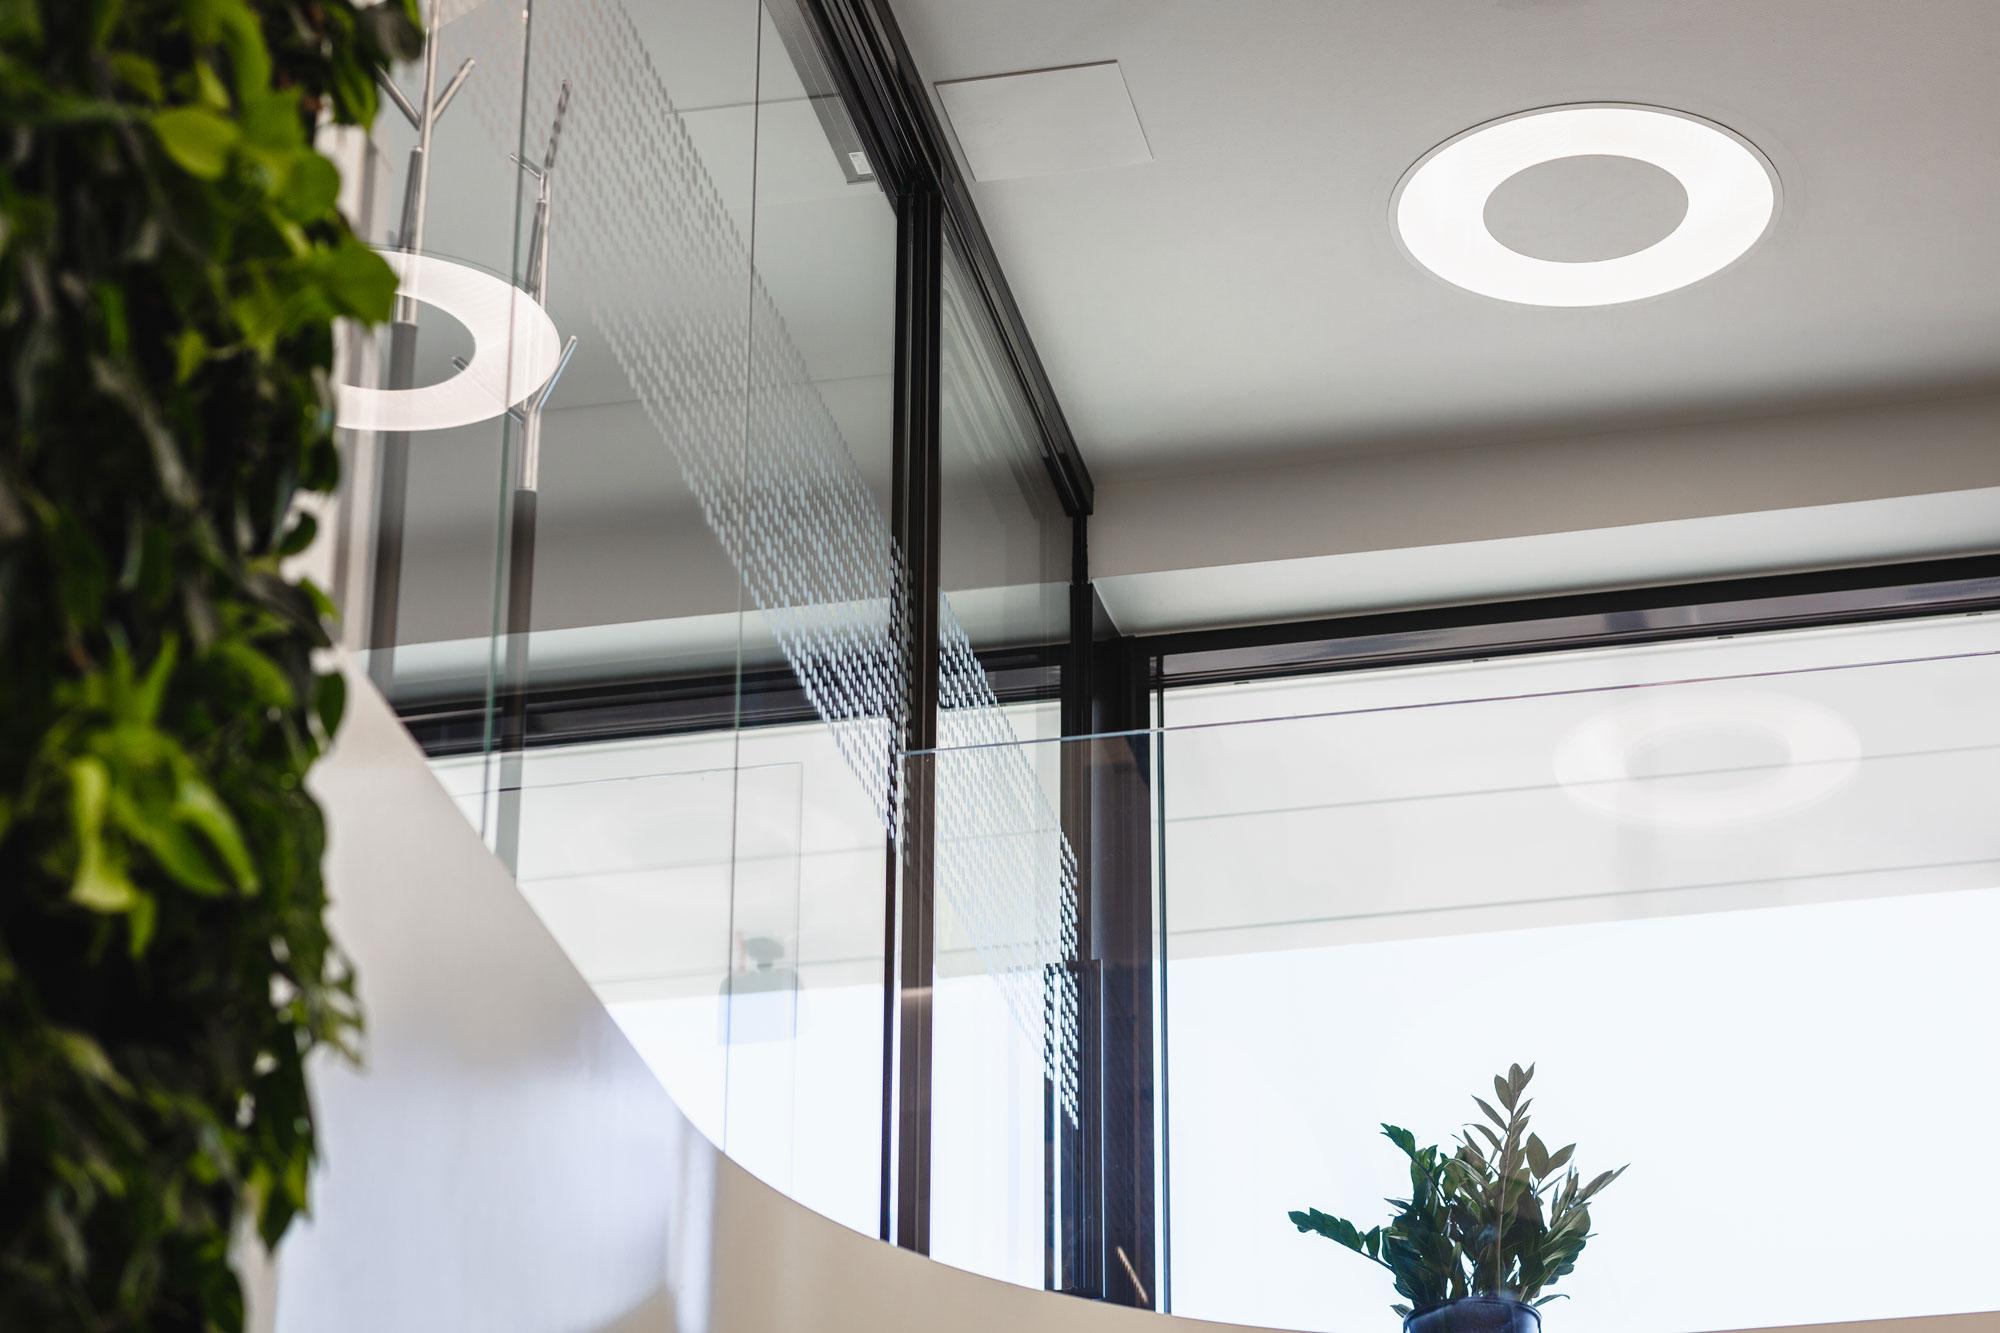 Scanmikael Office glass walls_Glass balustrades_OmaSp, Seinäjoki, Finland